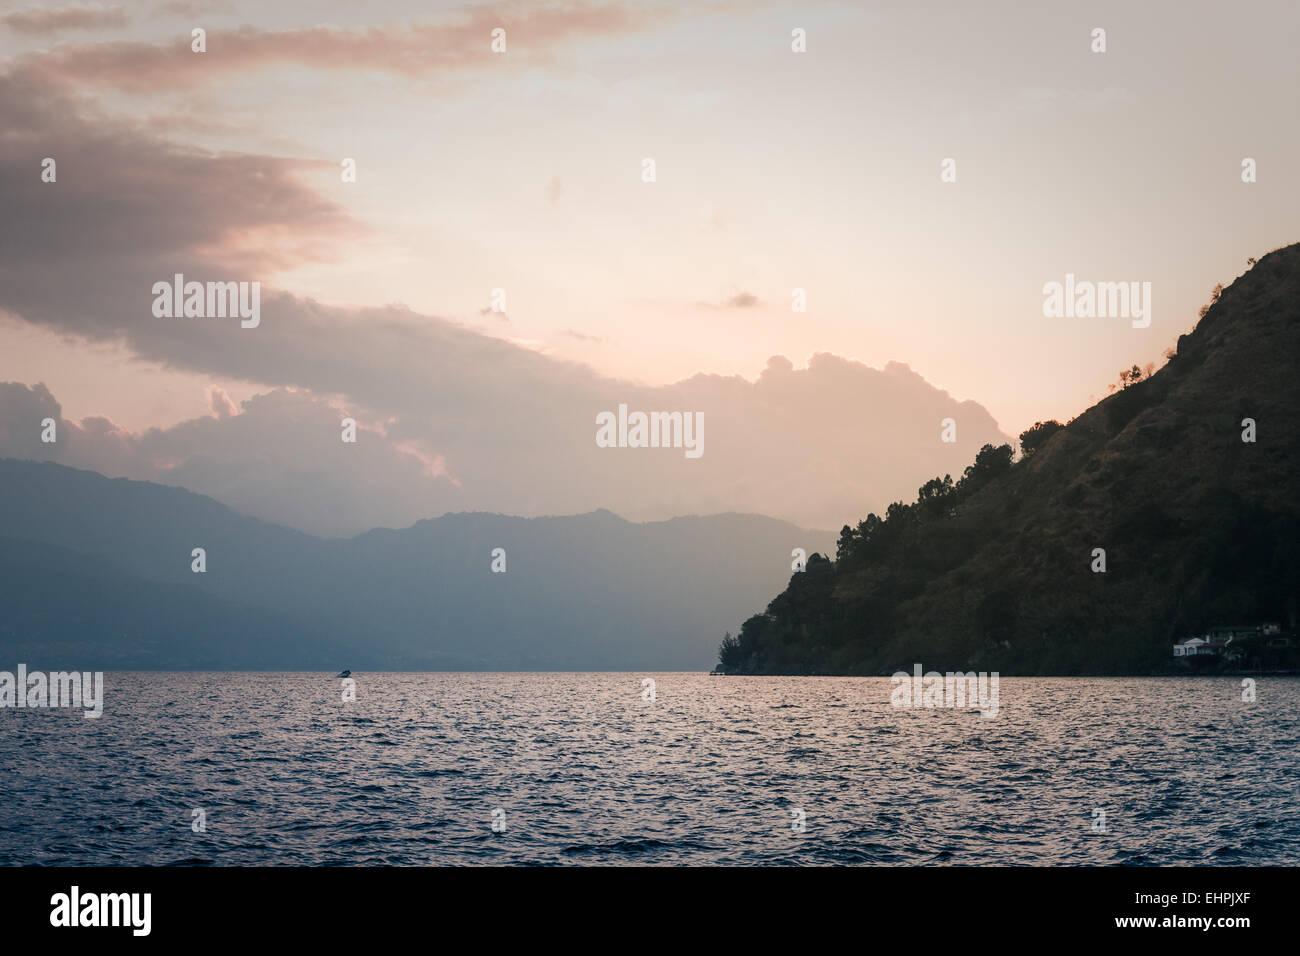 The Atitlan lake, Guatemala - Stock Image